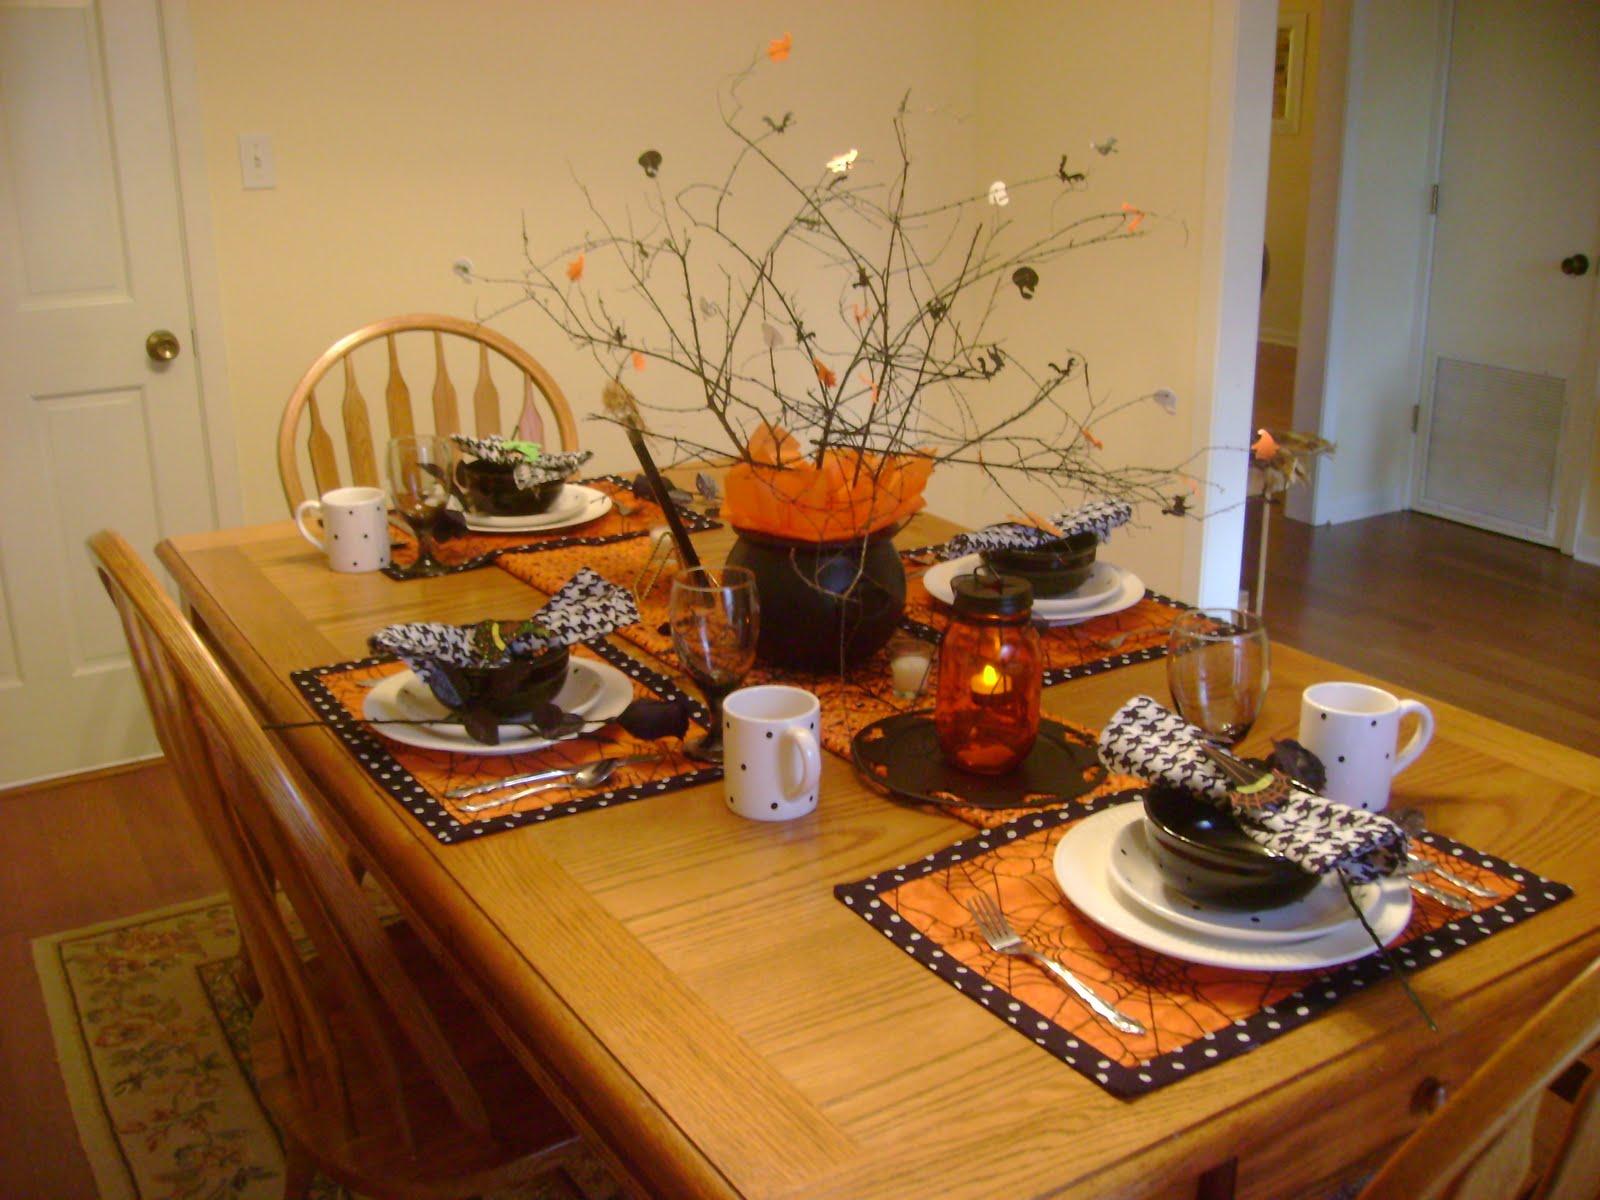 Halloween Interior Design 12 ideas to decorate your table for halloween – interior design